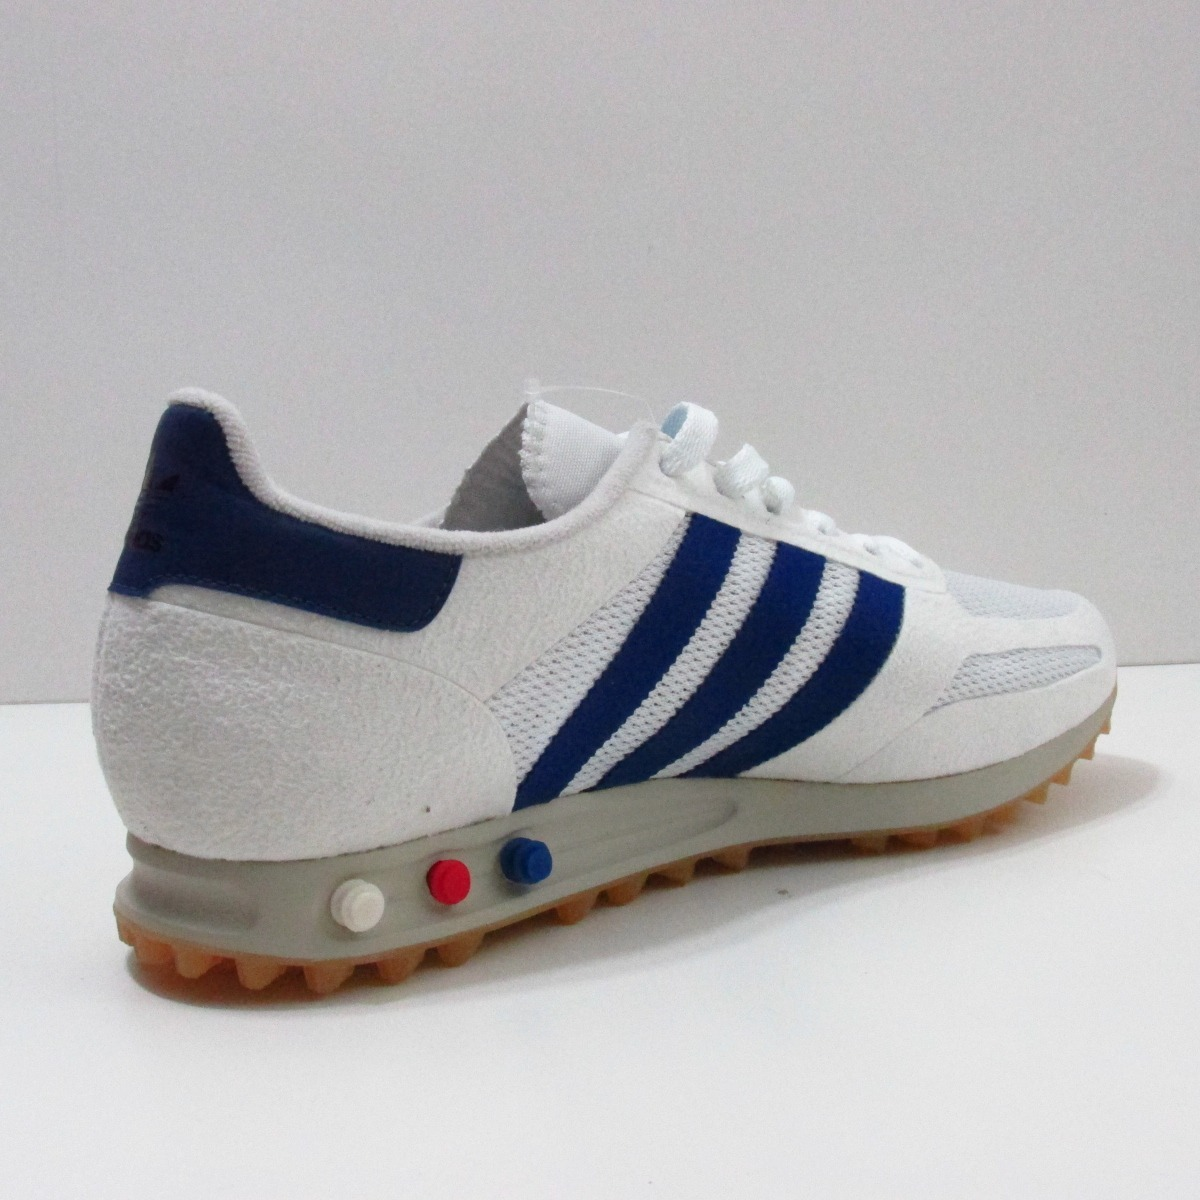 tênis masculino adidas originals la trainer produto europeu. Carregando zoom...  tênis masculino adidas. Carregando zoom. a70d7233600a0